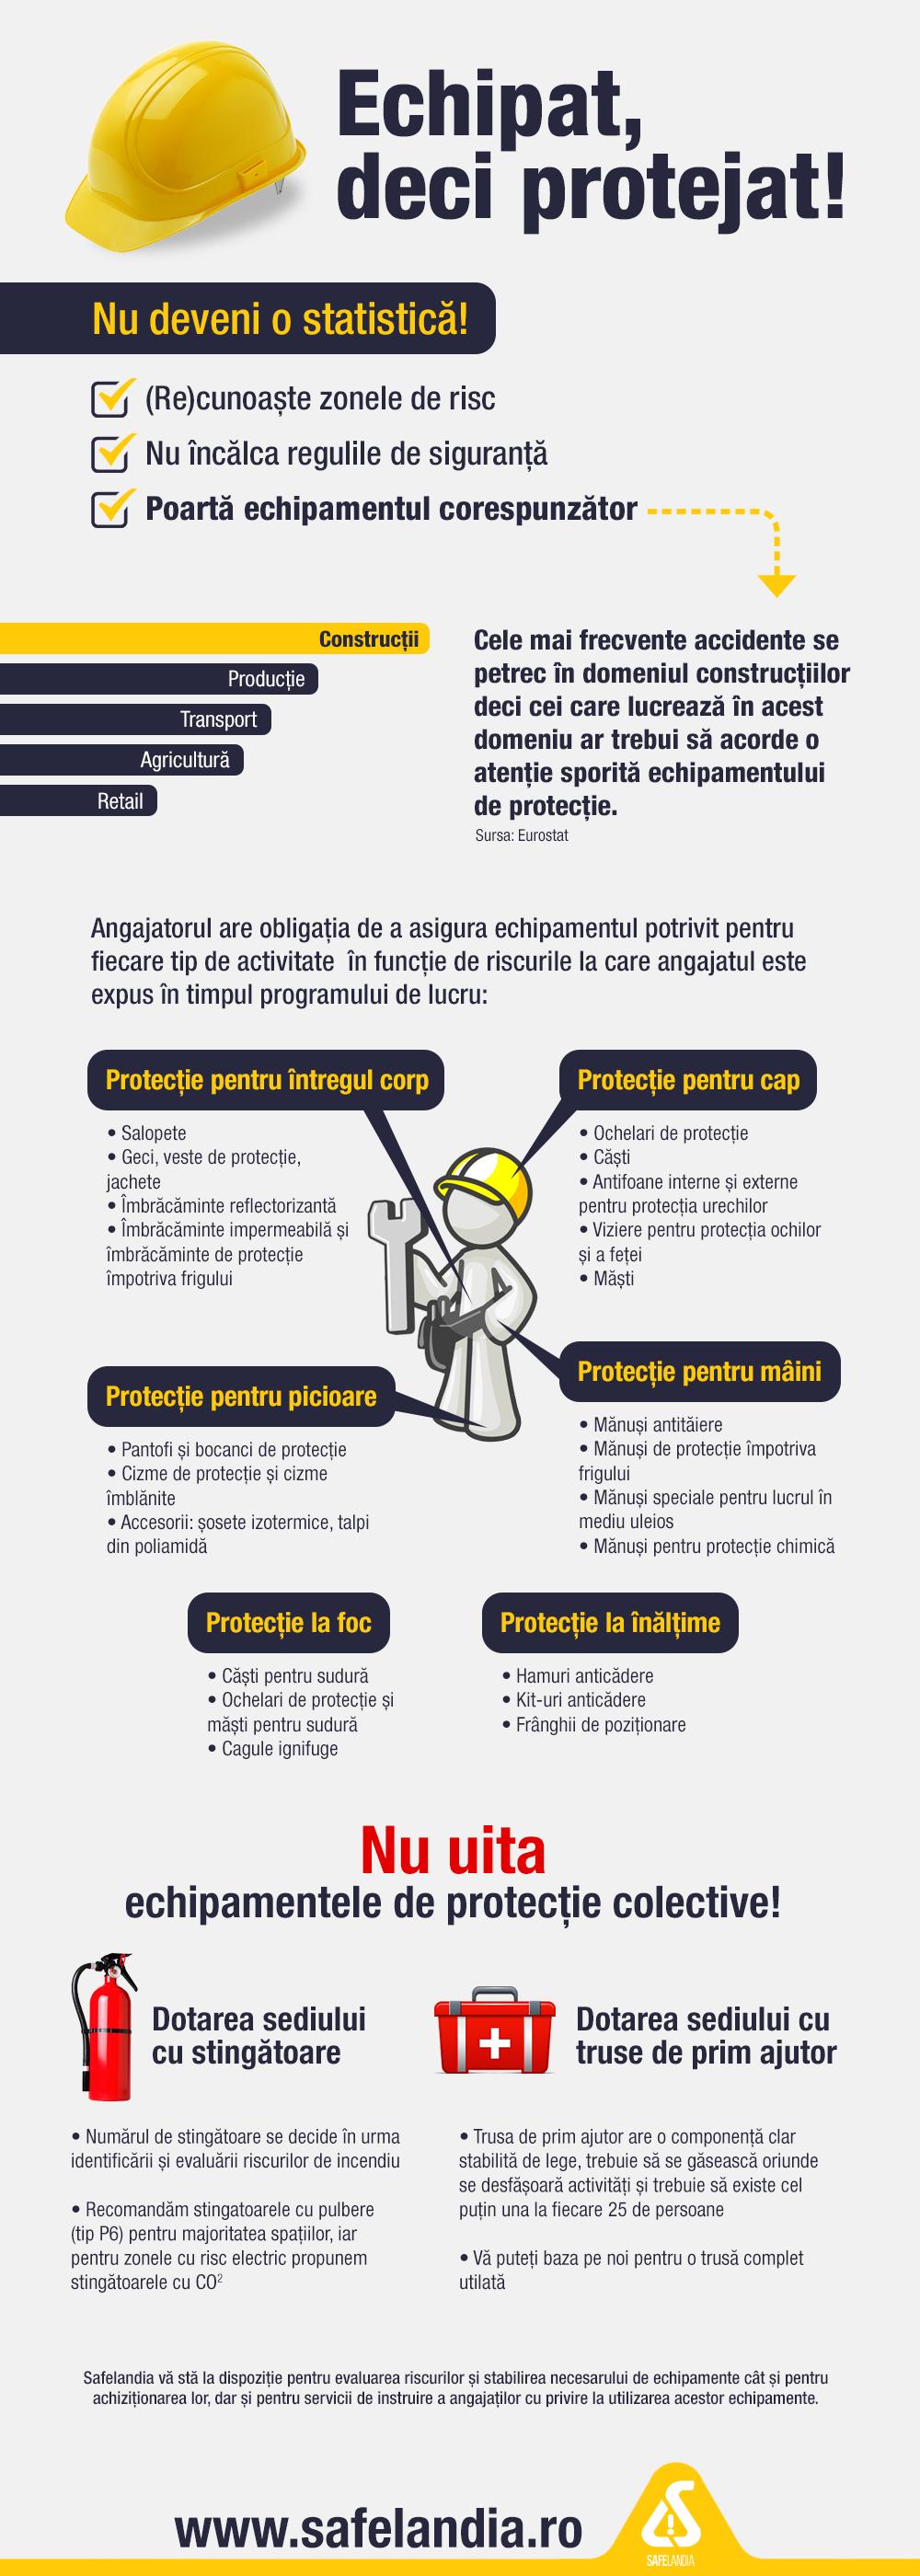 infographic_echipamente